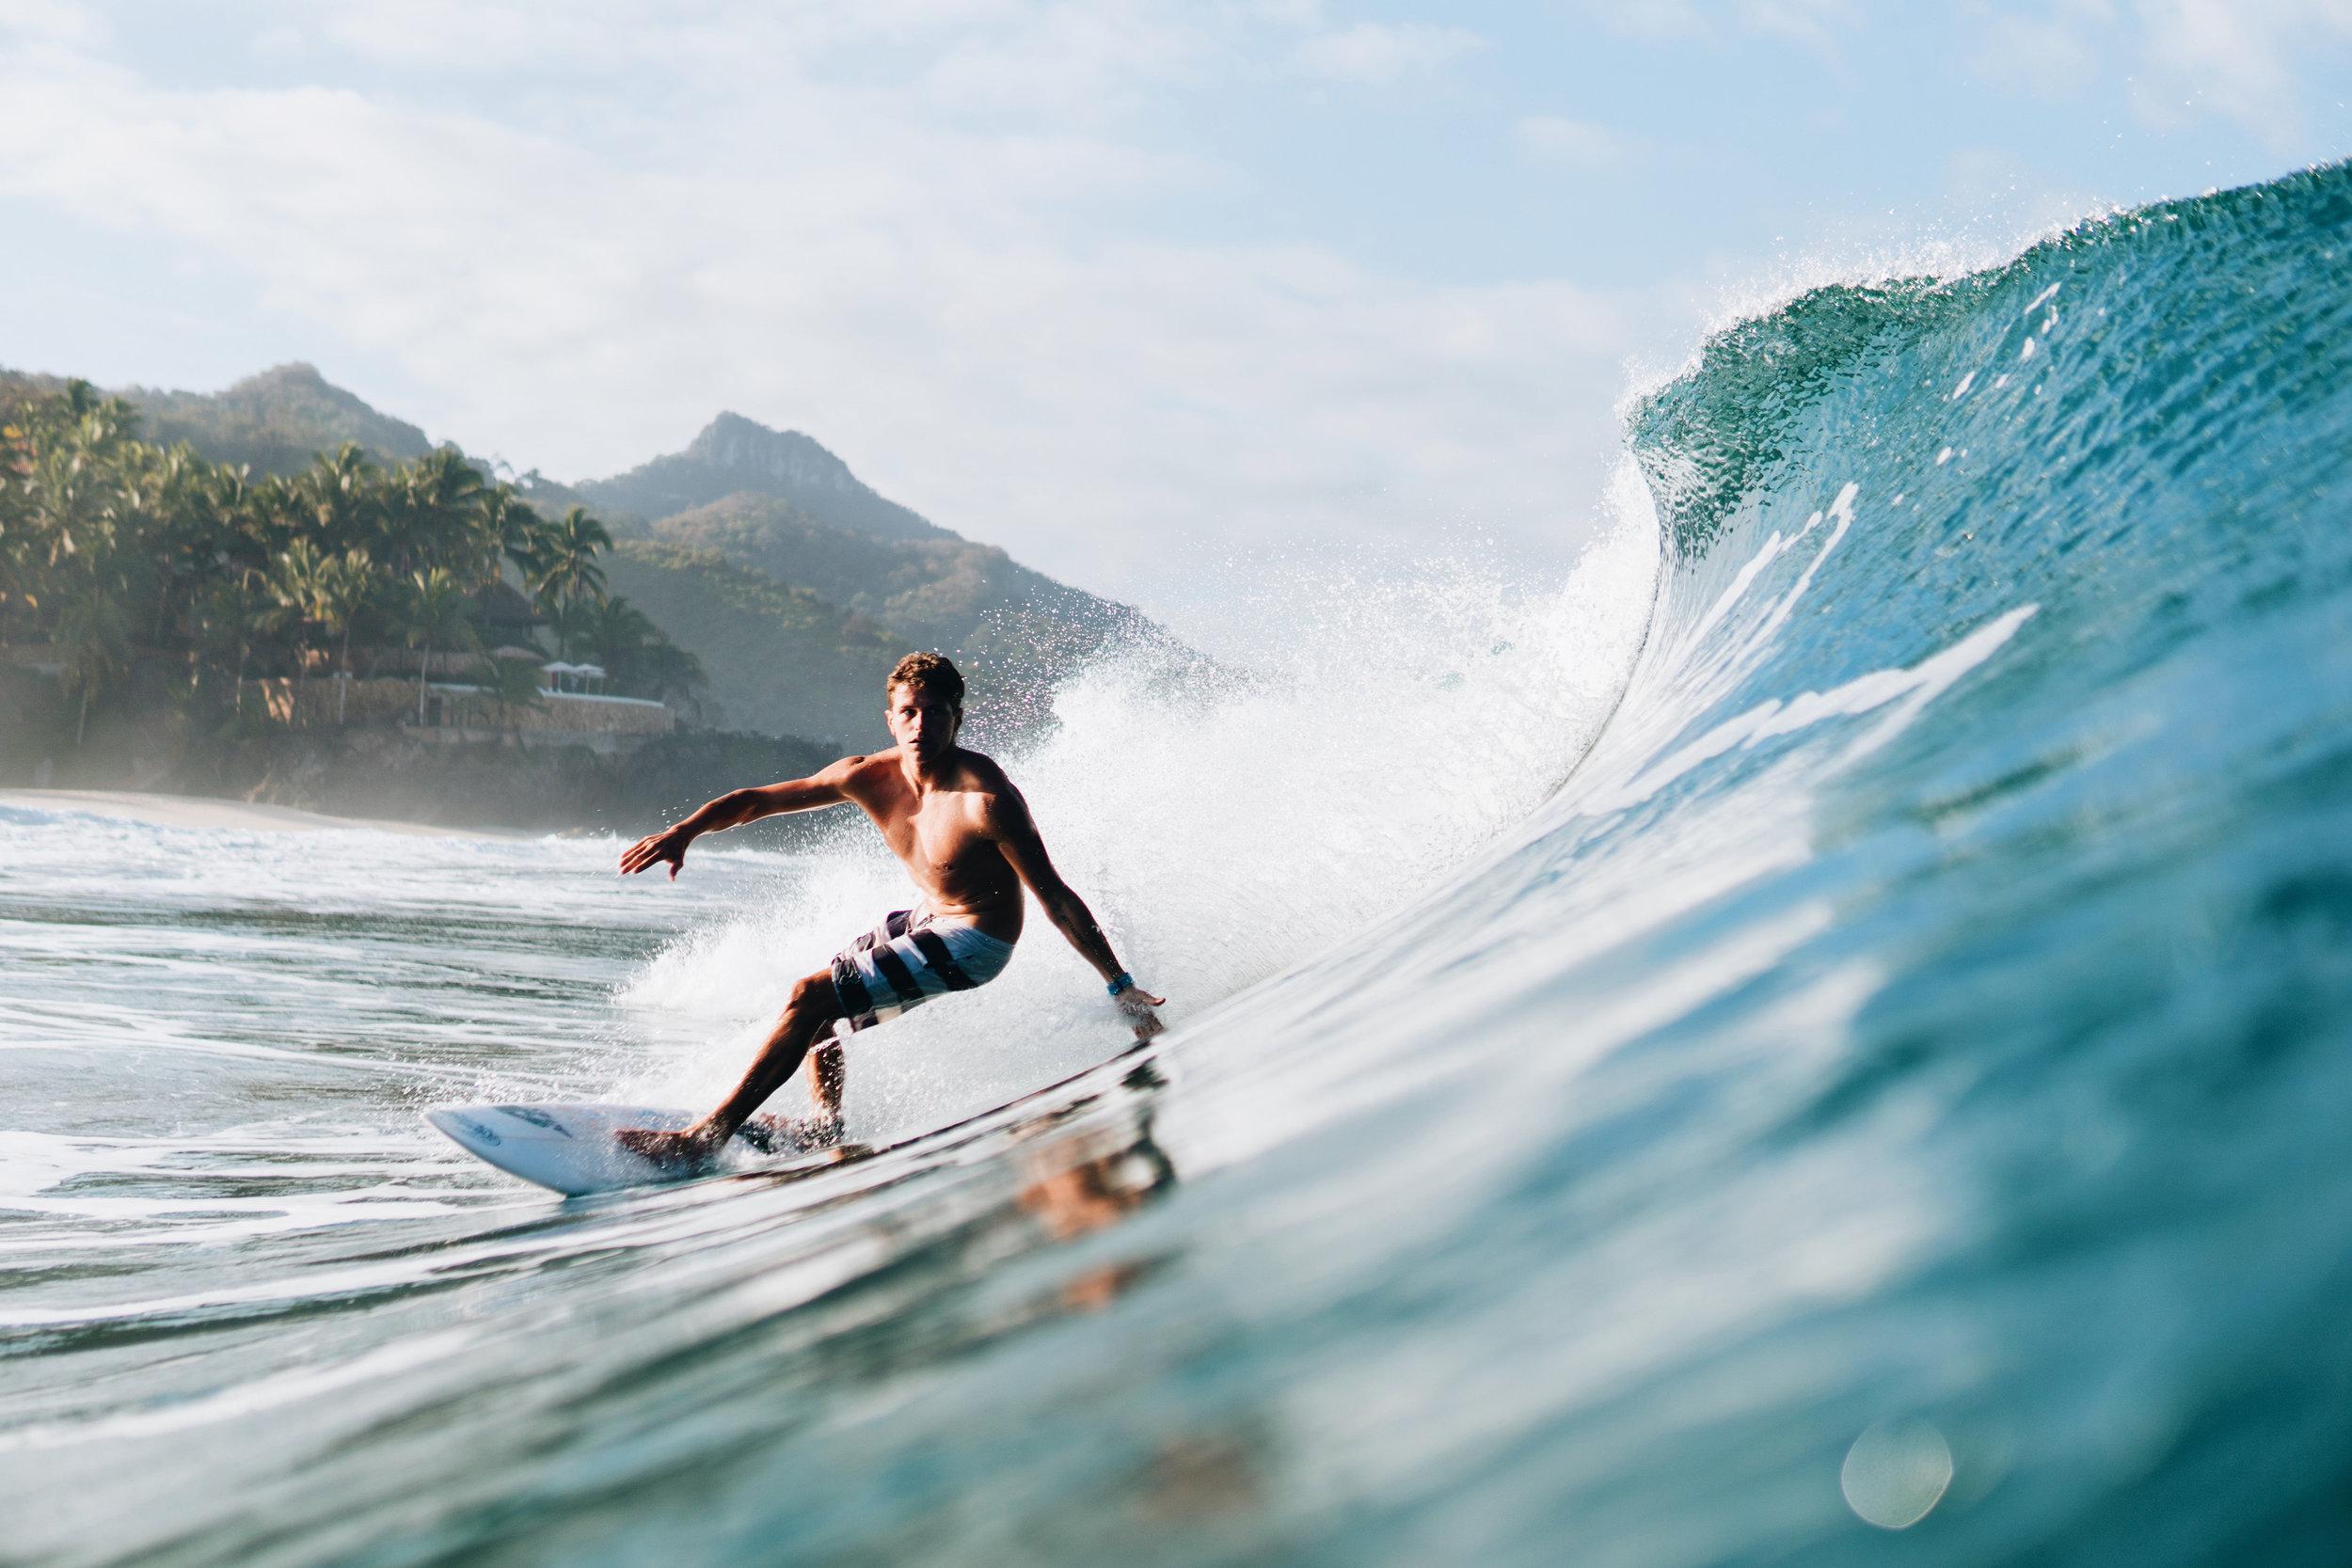 Sayulita-Mexico-Surf-Diego-Cadena-Kalle-Carranza-Dylan-Southworth-Gato-Rodriguez-Julien-Dorian-Gomez-Heiko-Bothe-24.JPG